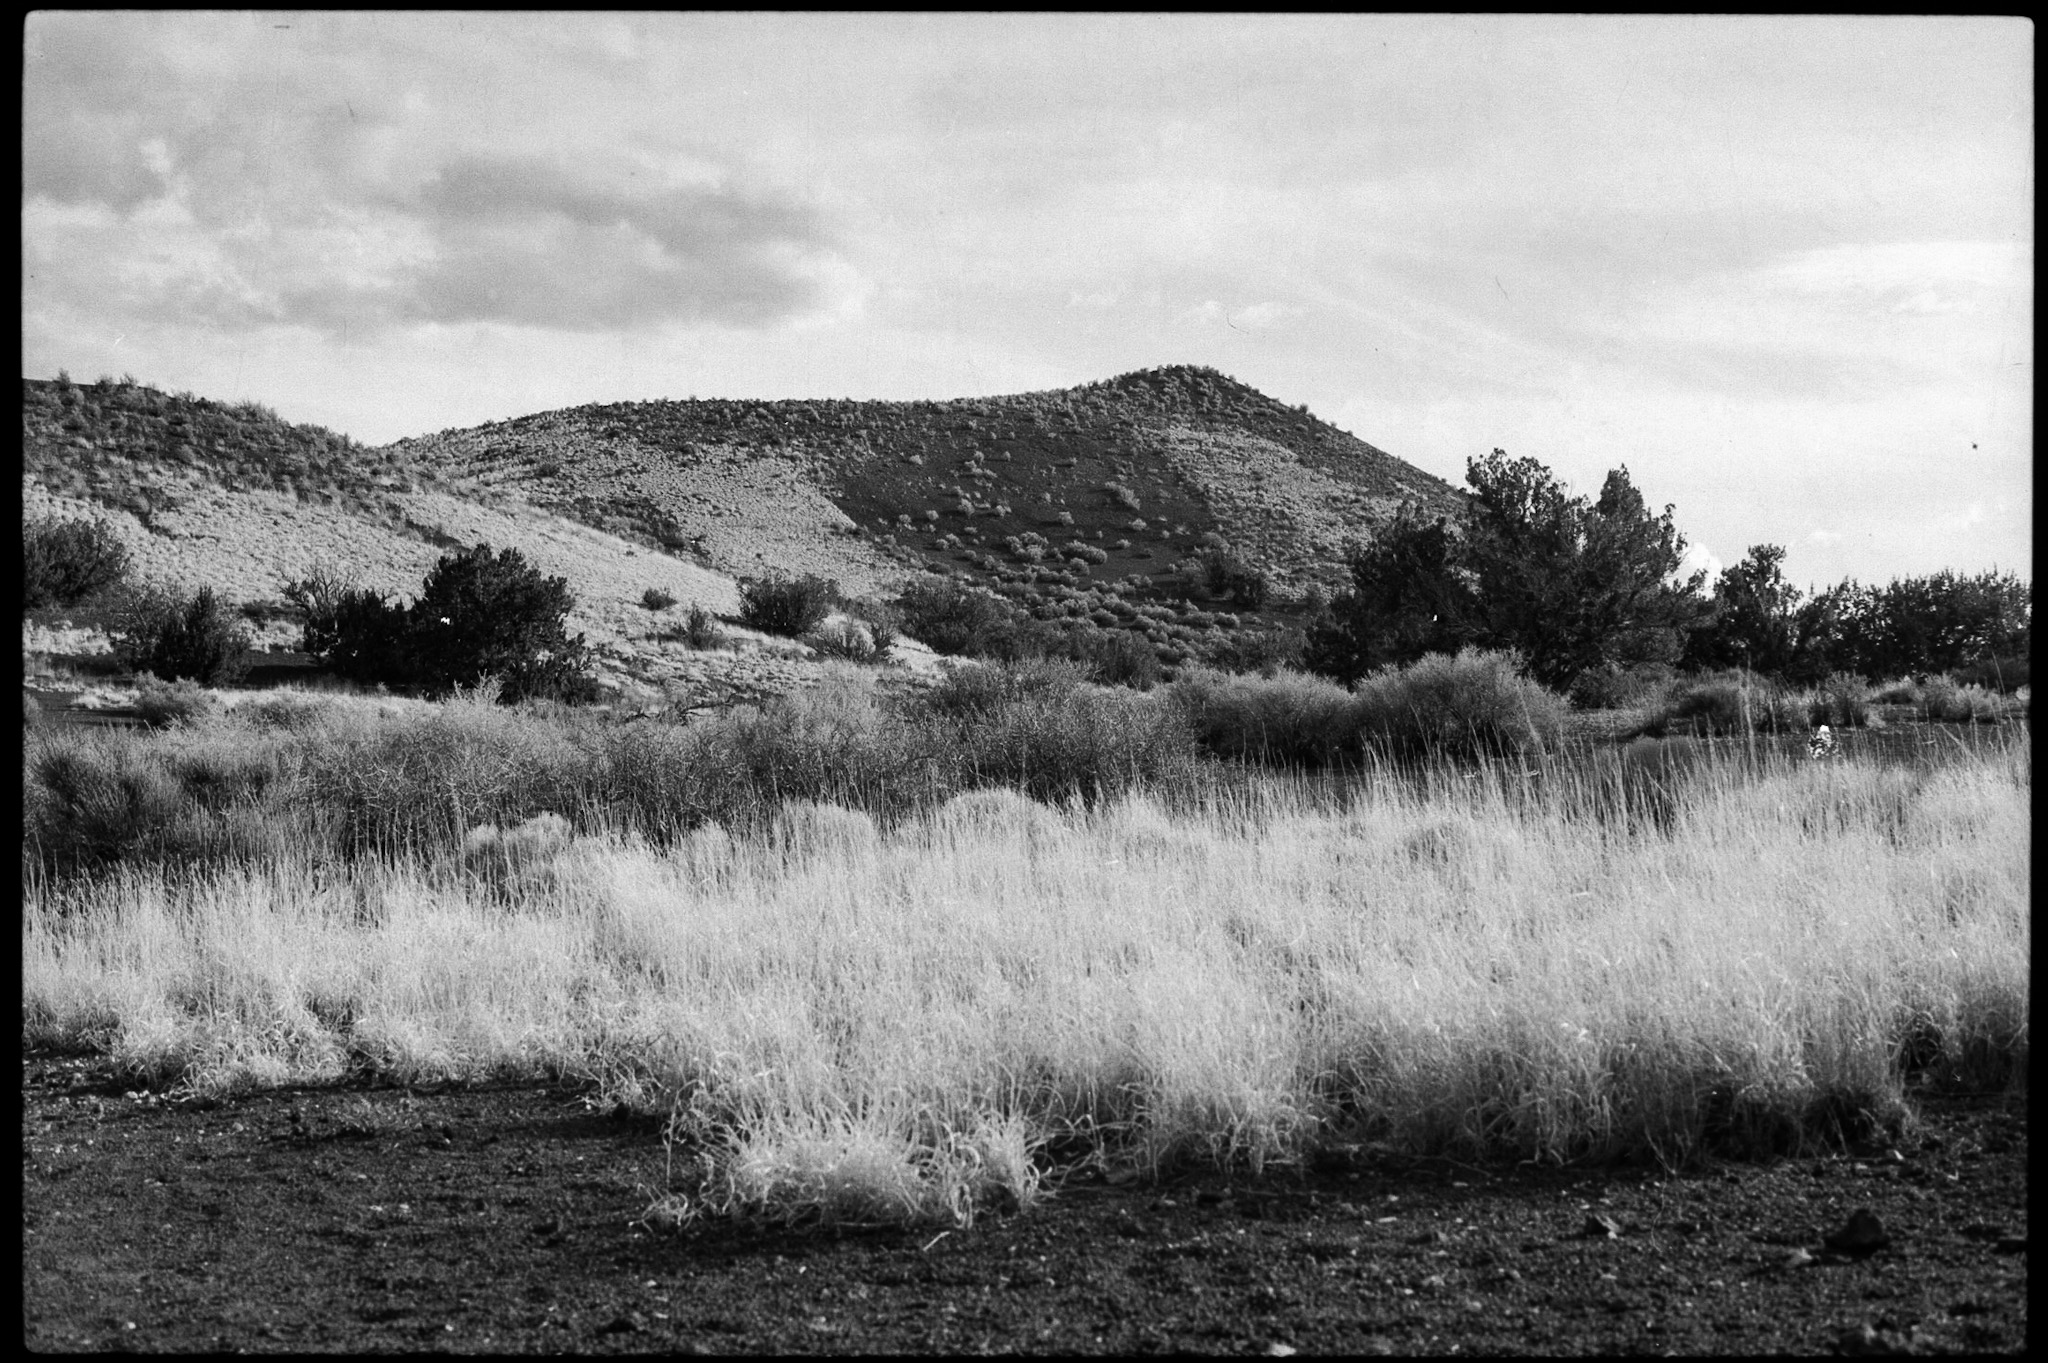 Vegetation along the base of Doney Mountain